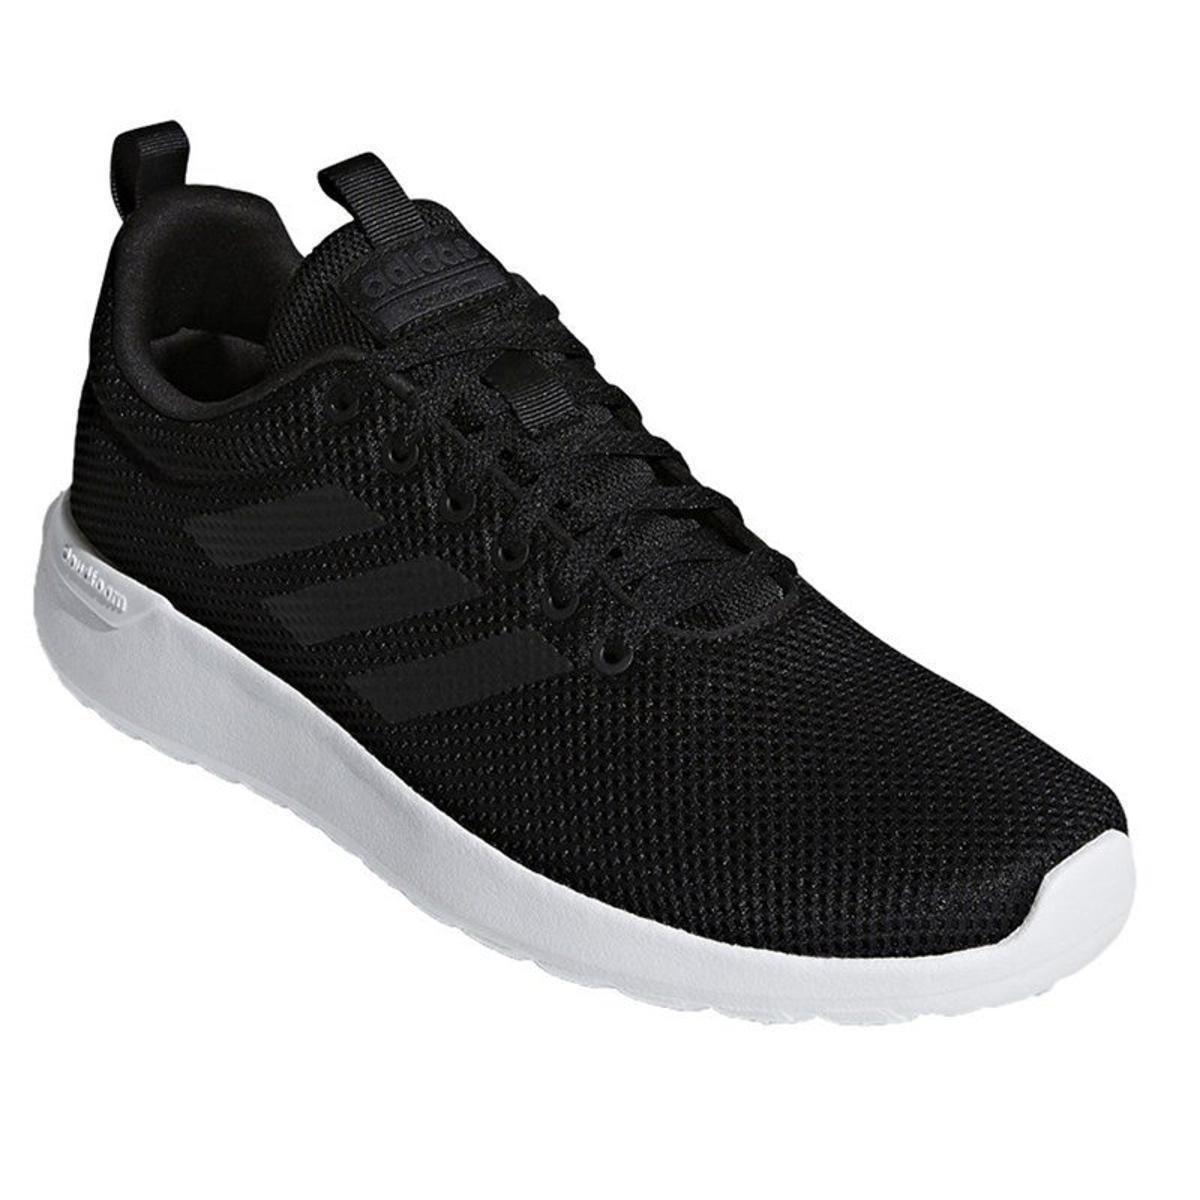 ba2a3727bb Tênis Adidas Lite Racer CLN Masculino Compre Agora Netsapatos Netsapatos  Agora 83f242